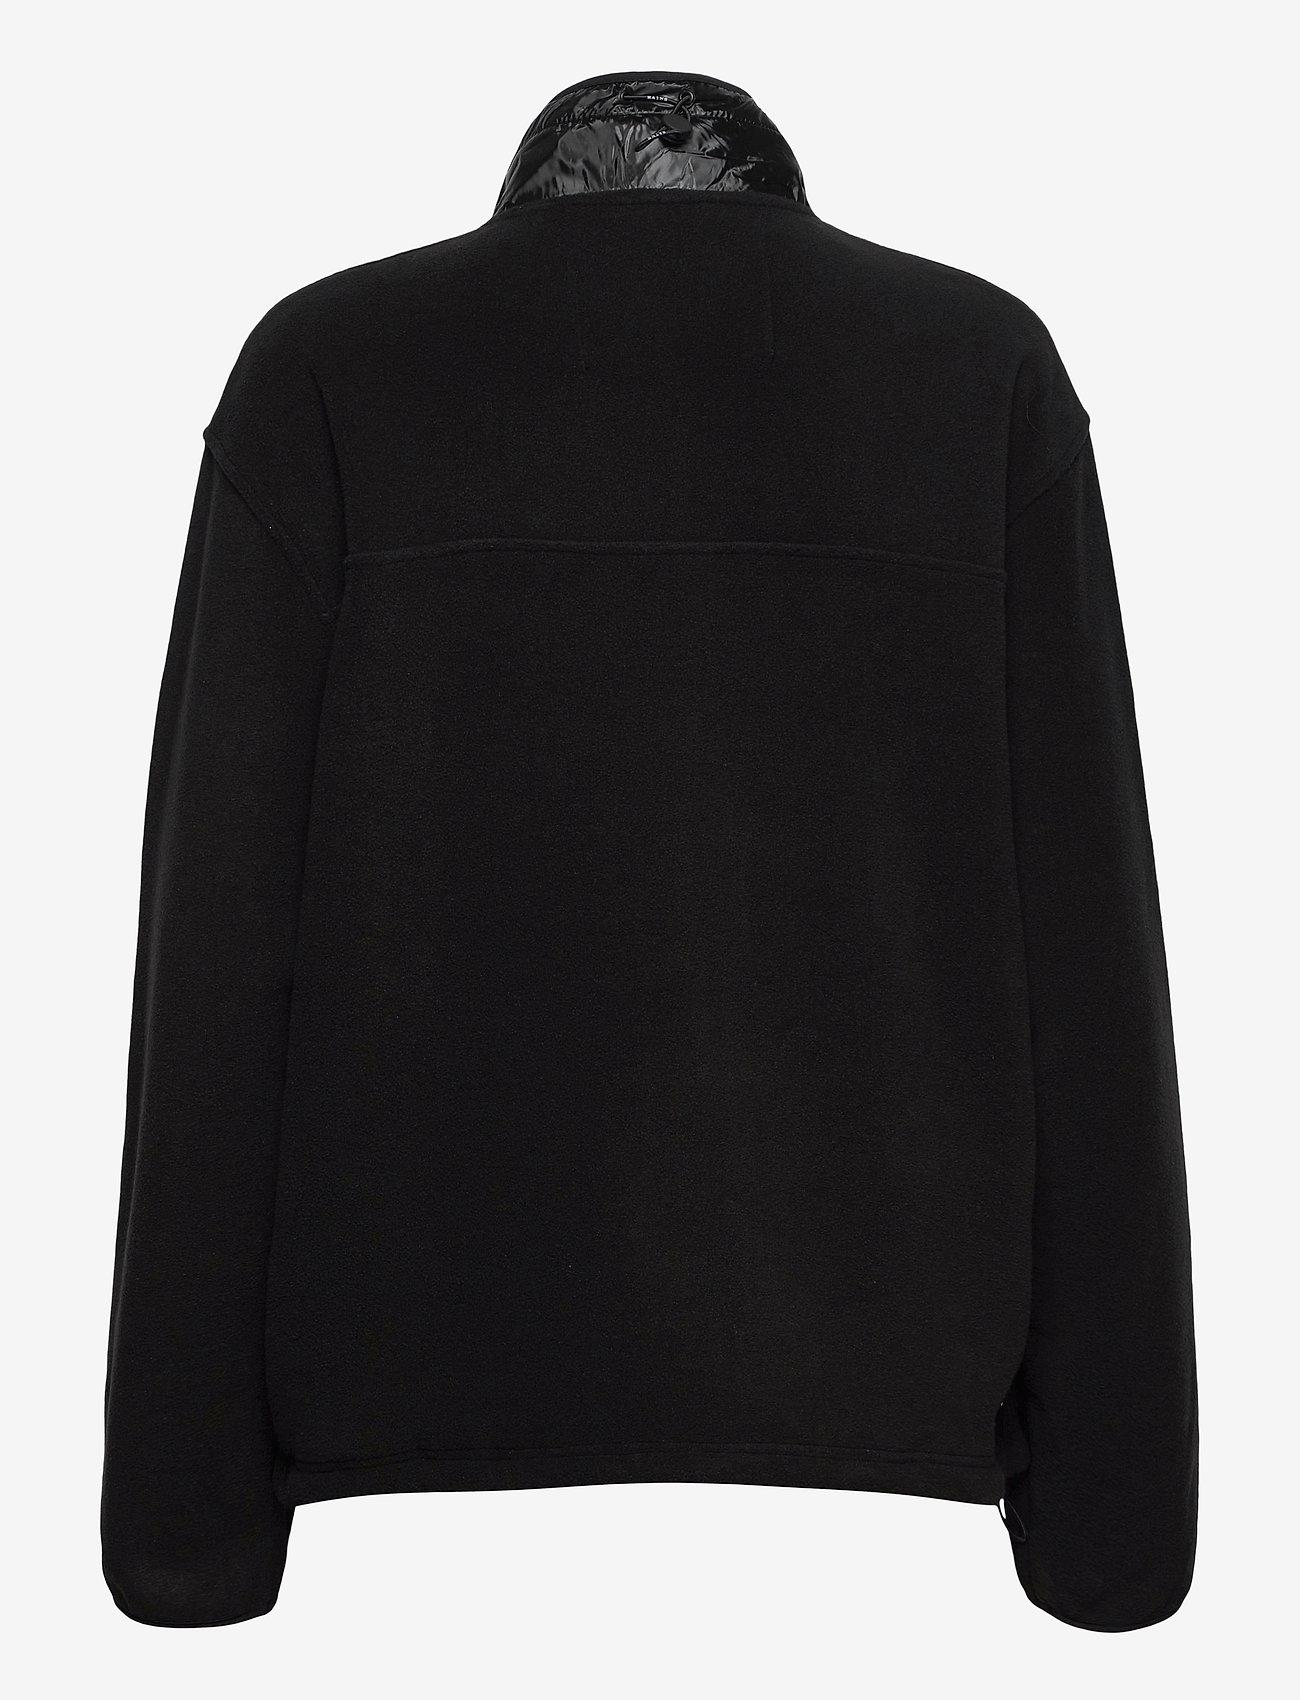 Rains - Fleece Jacket - basic-sweatshirts - 01 black - 1